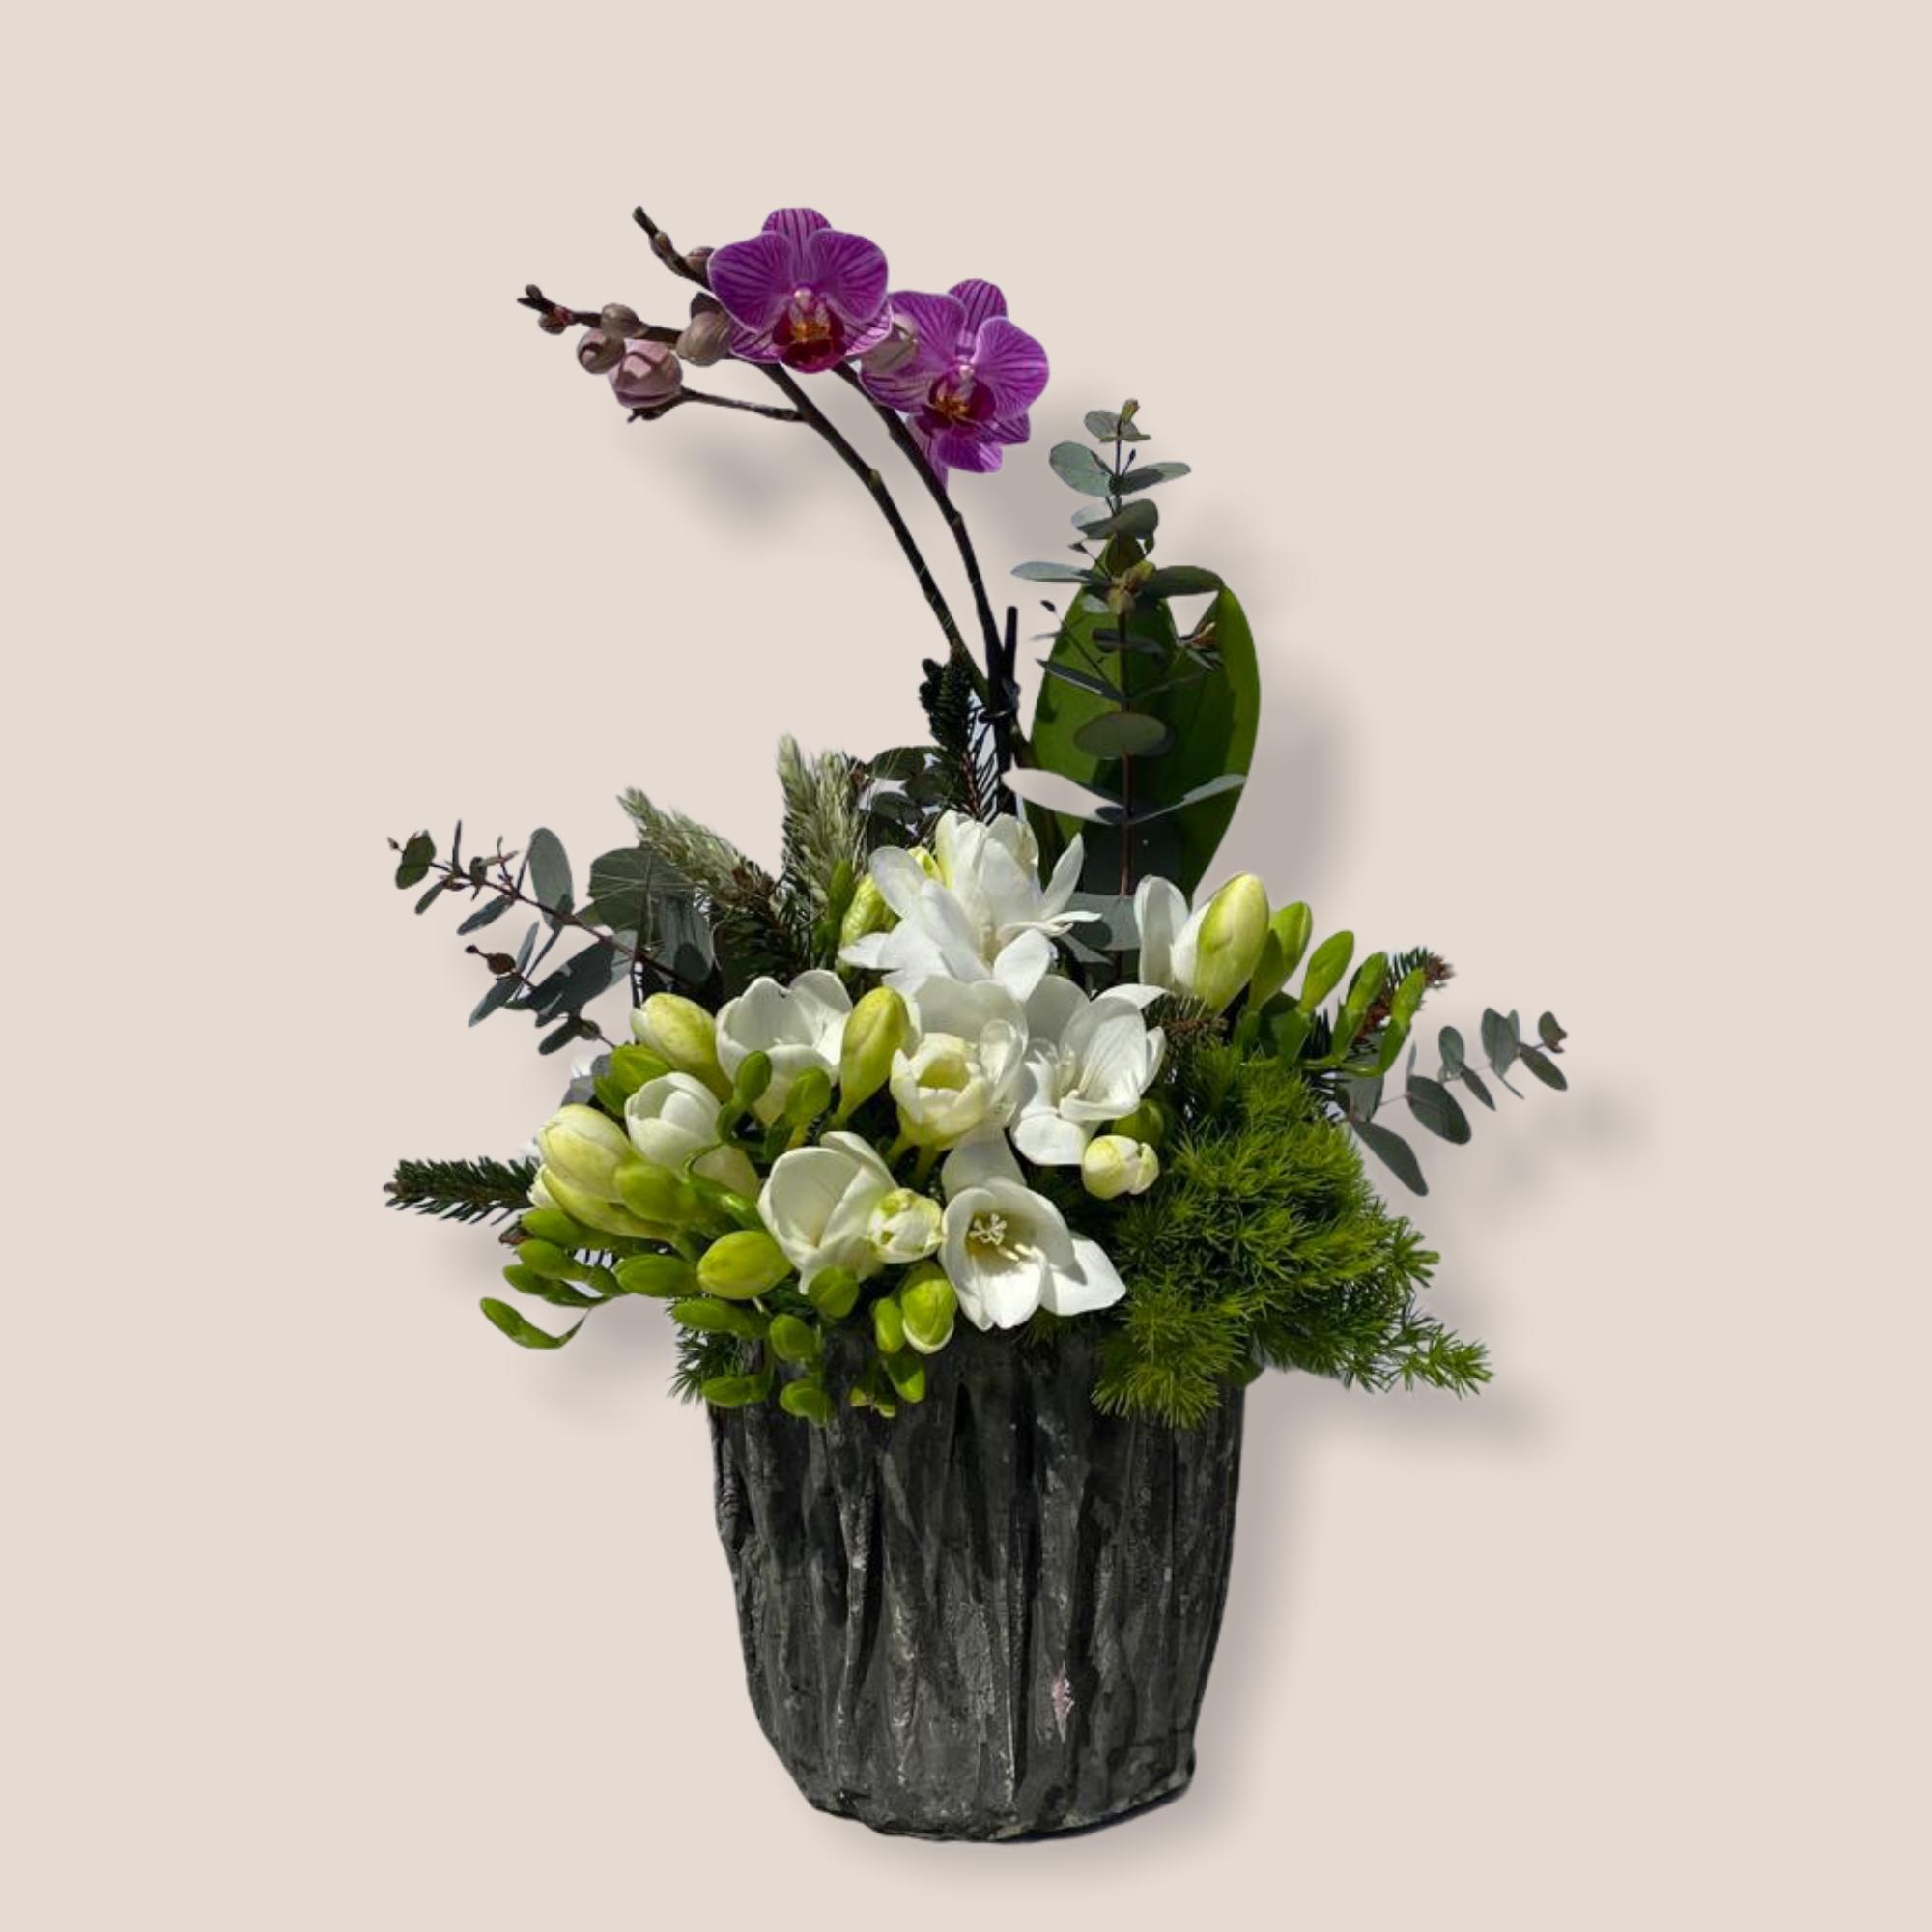 Violet Mini Orkideli Frezya Serisi